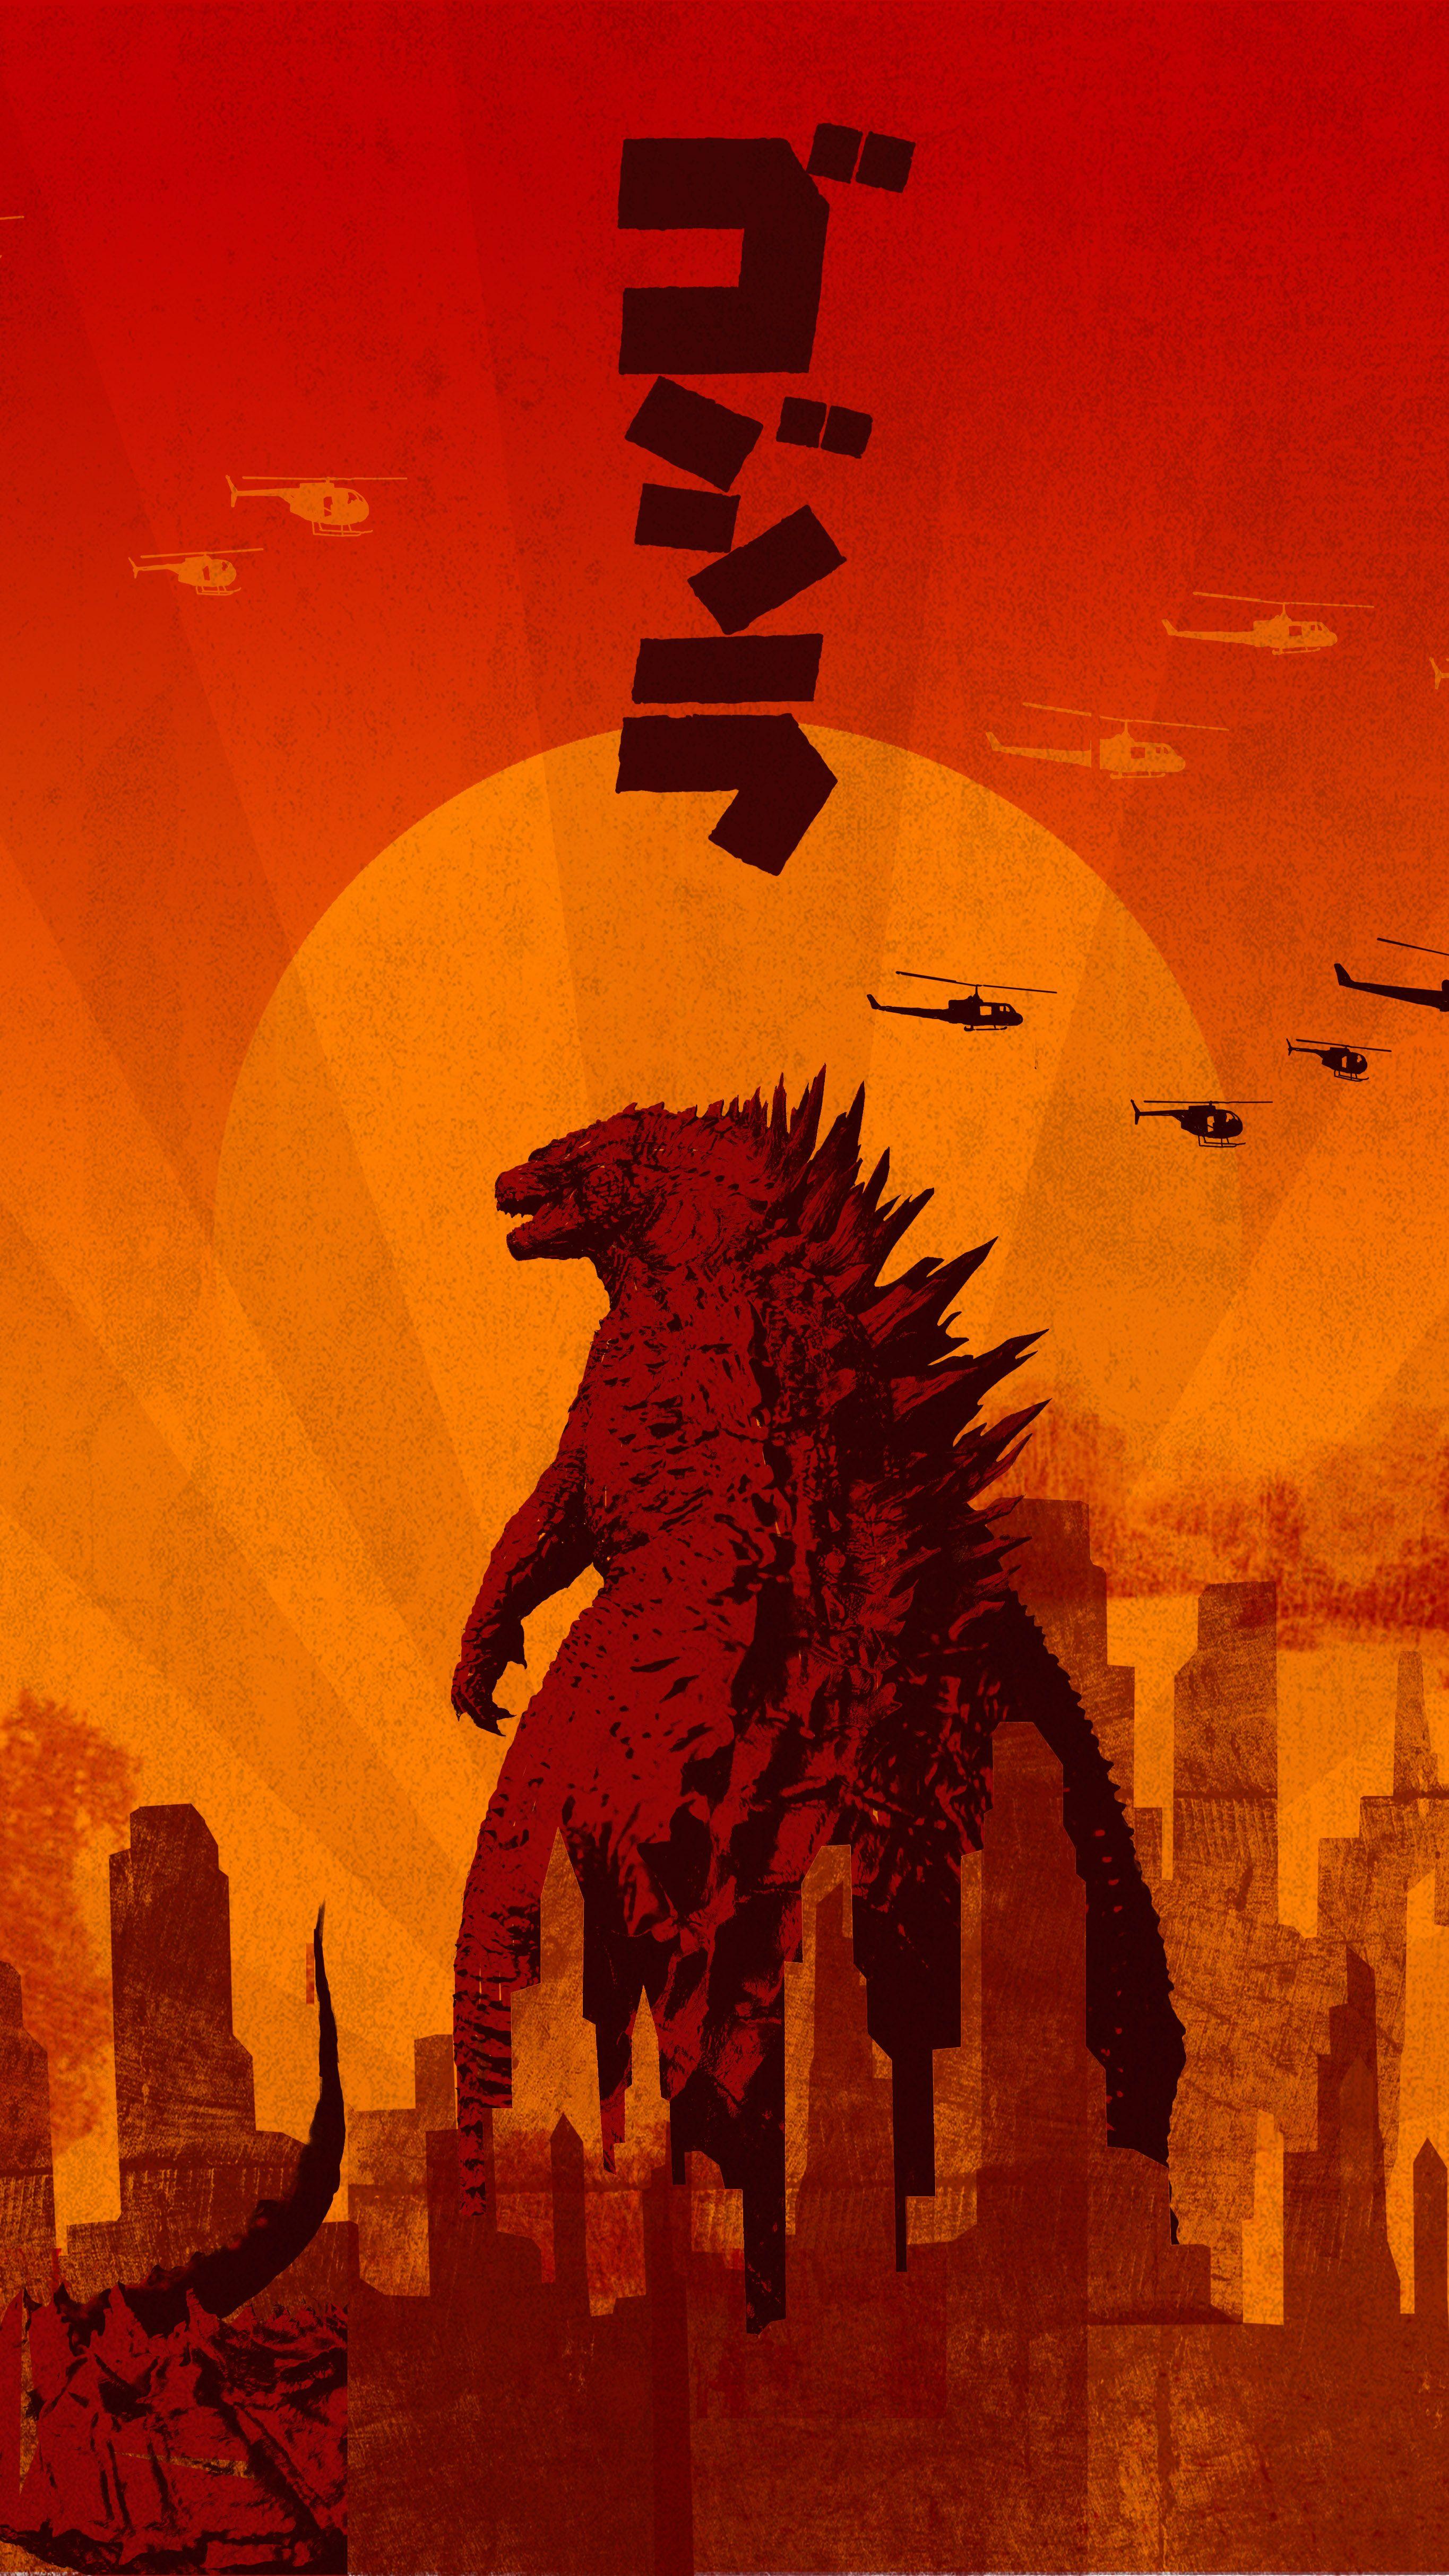 Wallpapers Phone Wallpapers Pt 2 Godzilla Wallpaper Kaiju Art Godzilla